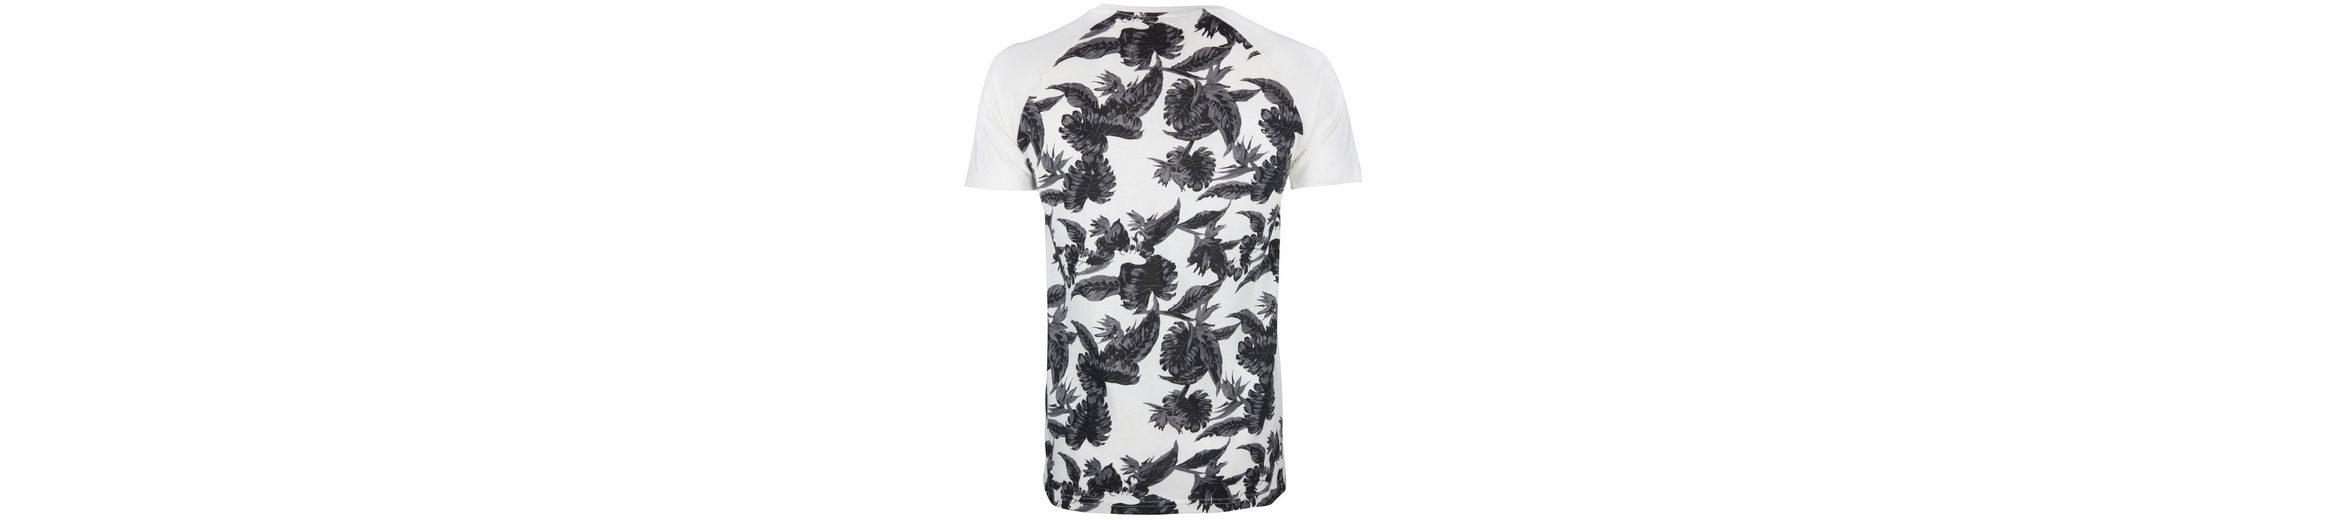 SOULSTAR T-Shirt Billigsten Günstig Online Schlussverkauf 4CpHl1XExu